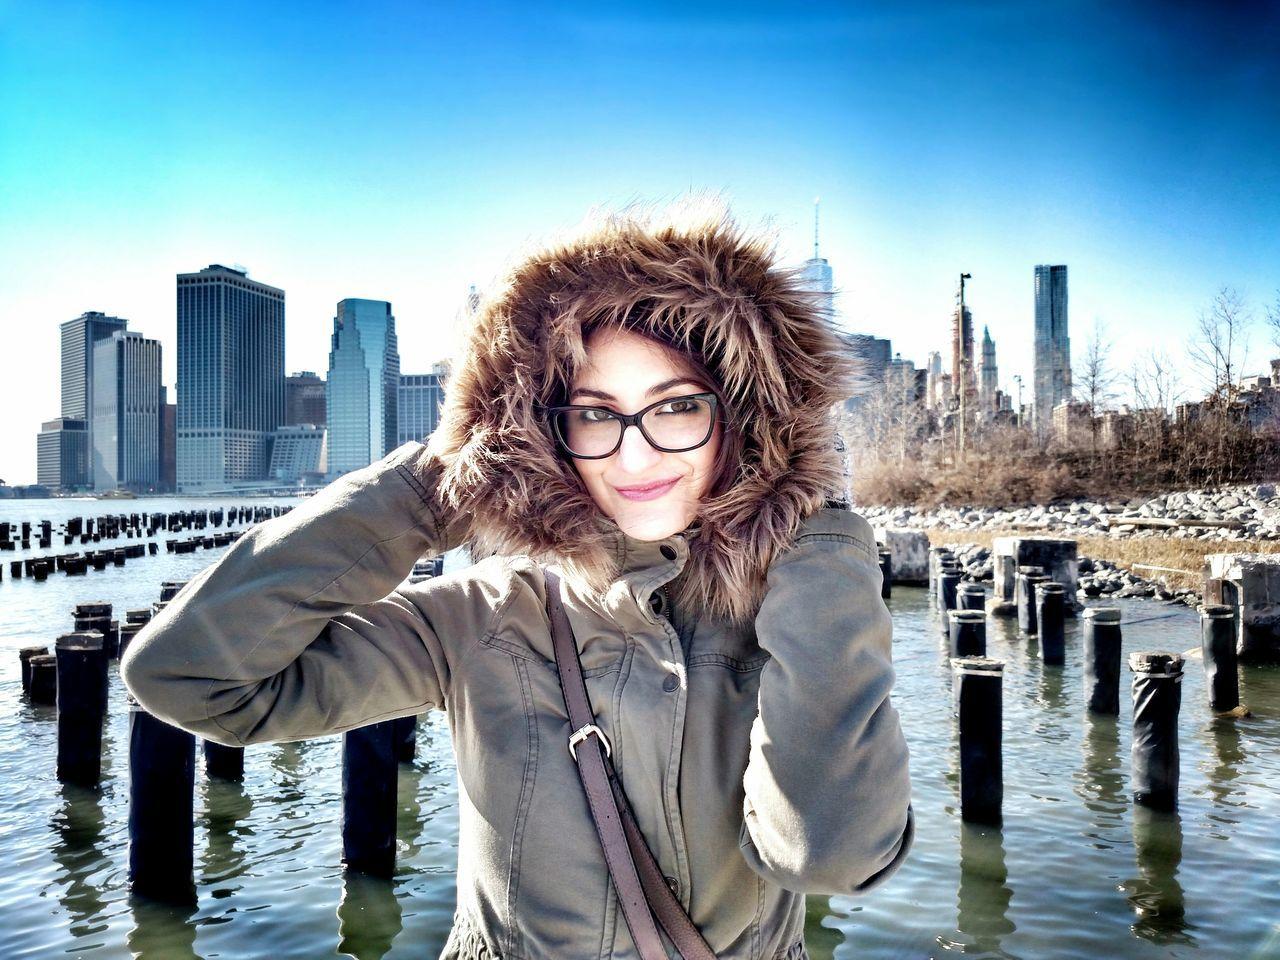 Beautiful stock photos of niedlich, 25-29 Years, Brooklyn, Horizontal Image, Park